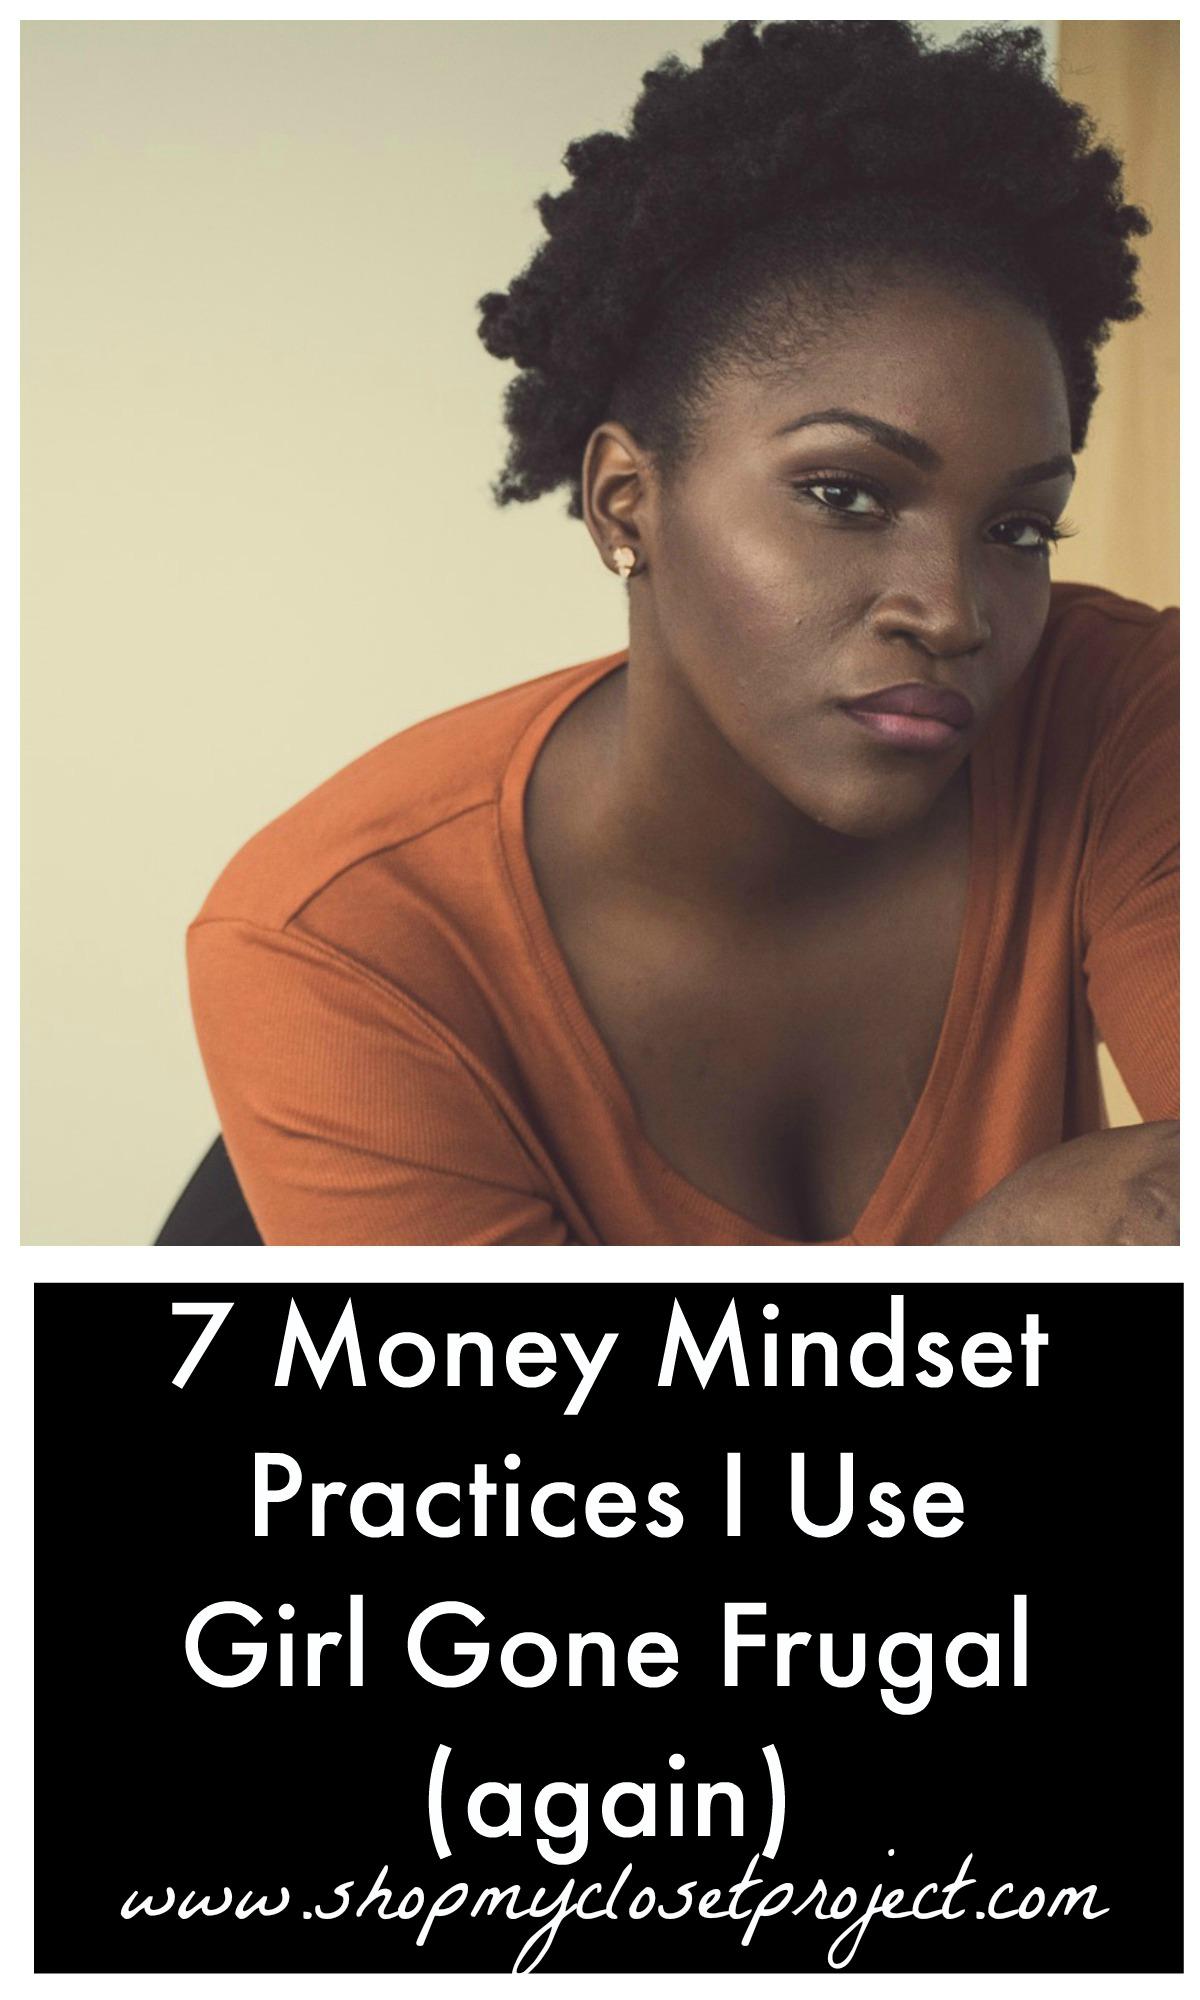 7 Money Mindset Practices I Use-Girl Gone Frugal (again)